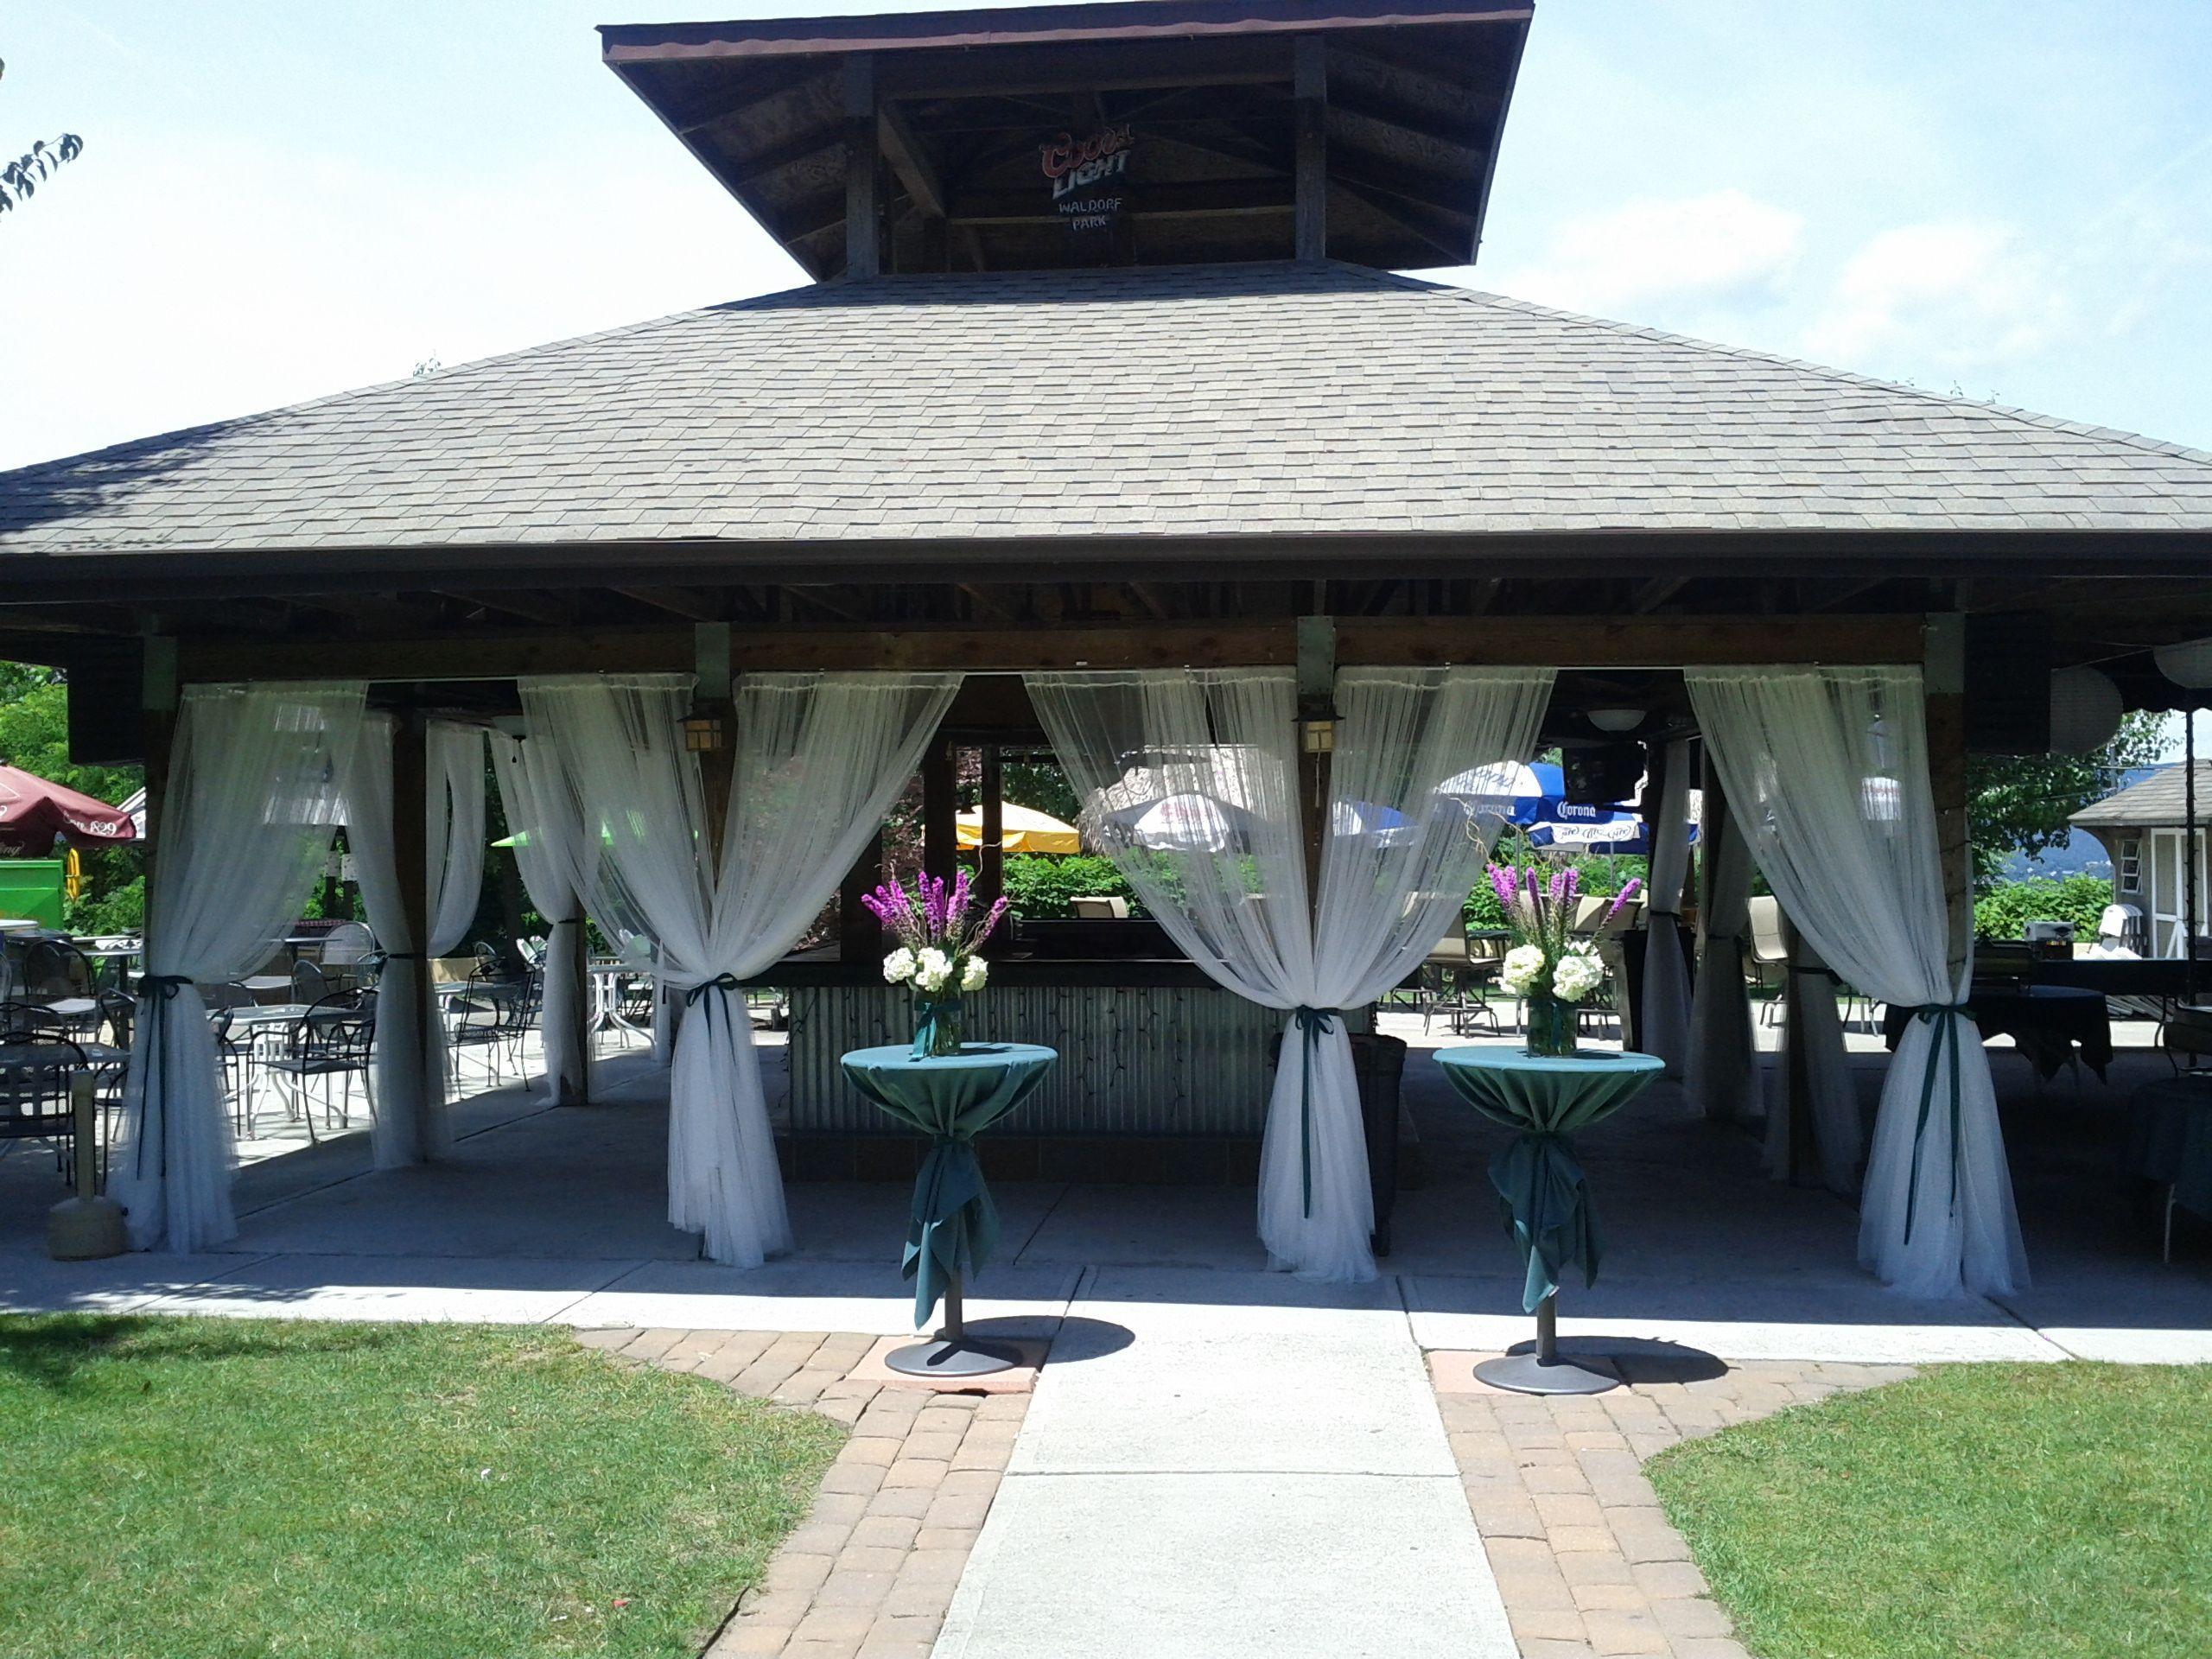 Pavilion Table Wedding Picnic Ideas Decorating